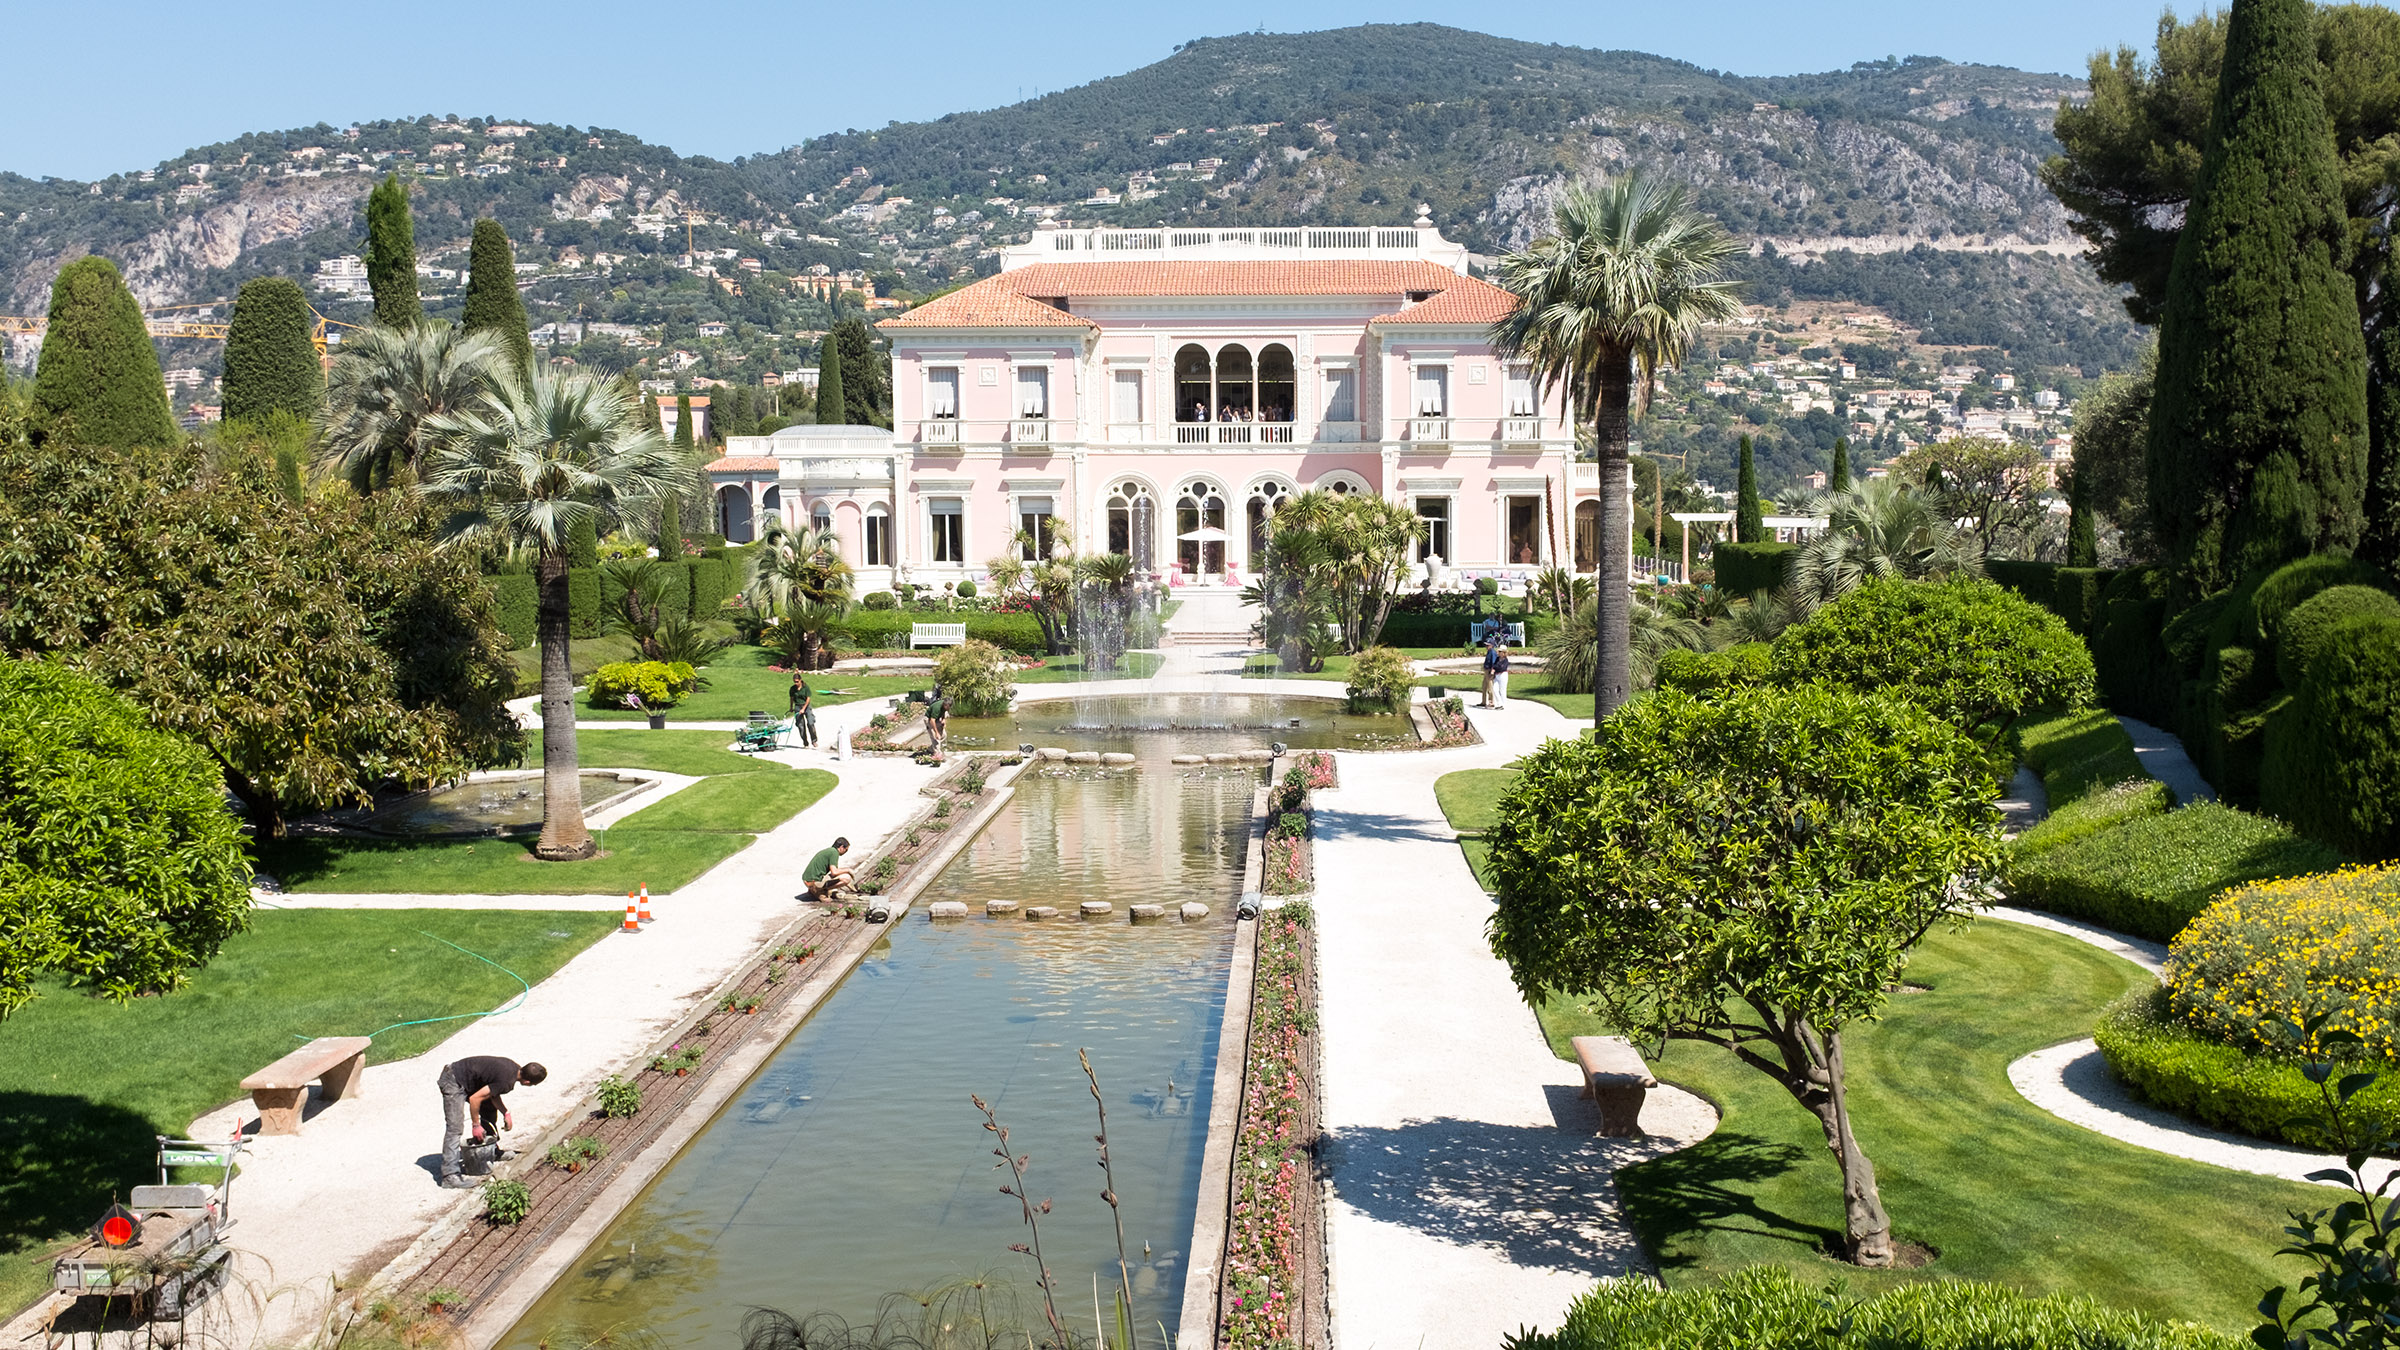 The Kiechle Family The Area Villa Ephrussi De Rothschild